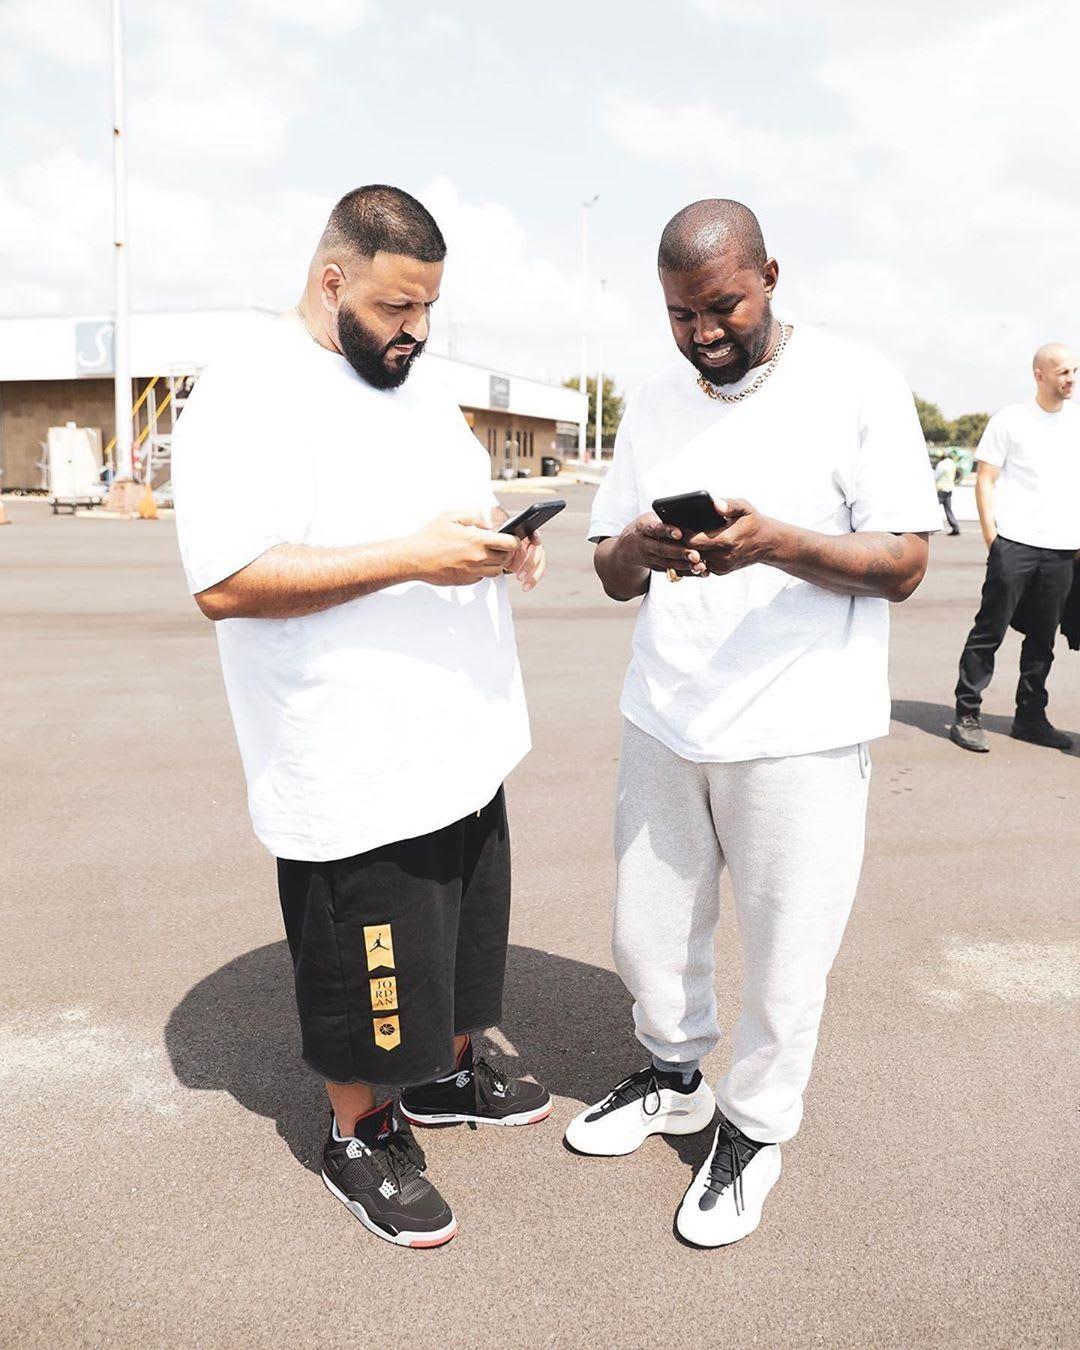 Kanye West Gifts DJ Khaled Unreleased Yeezy 700 V3 Eneste    Kanye West Gaver DJ Khaled Uudgivet Yeezy 700 V3   title=          Sole